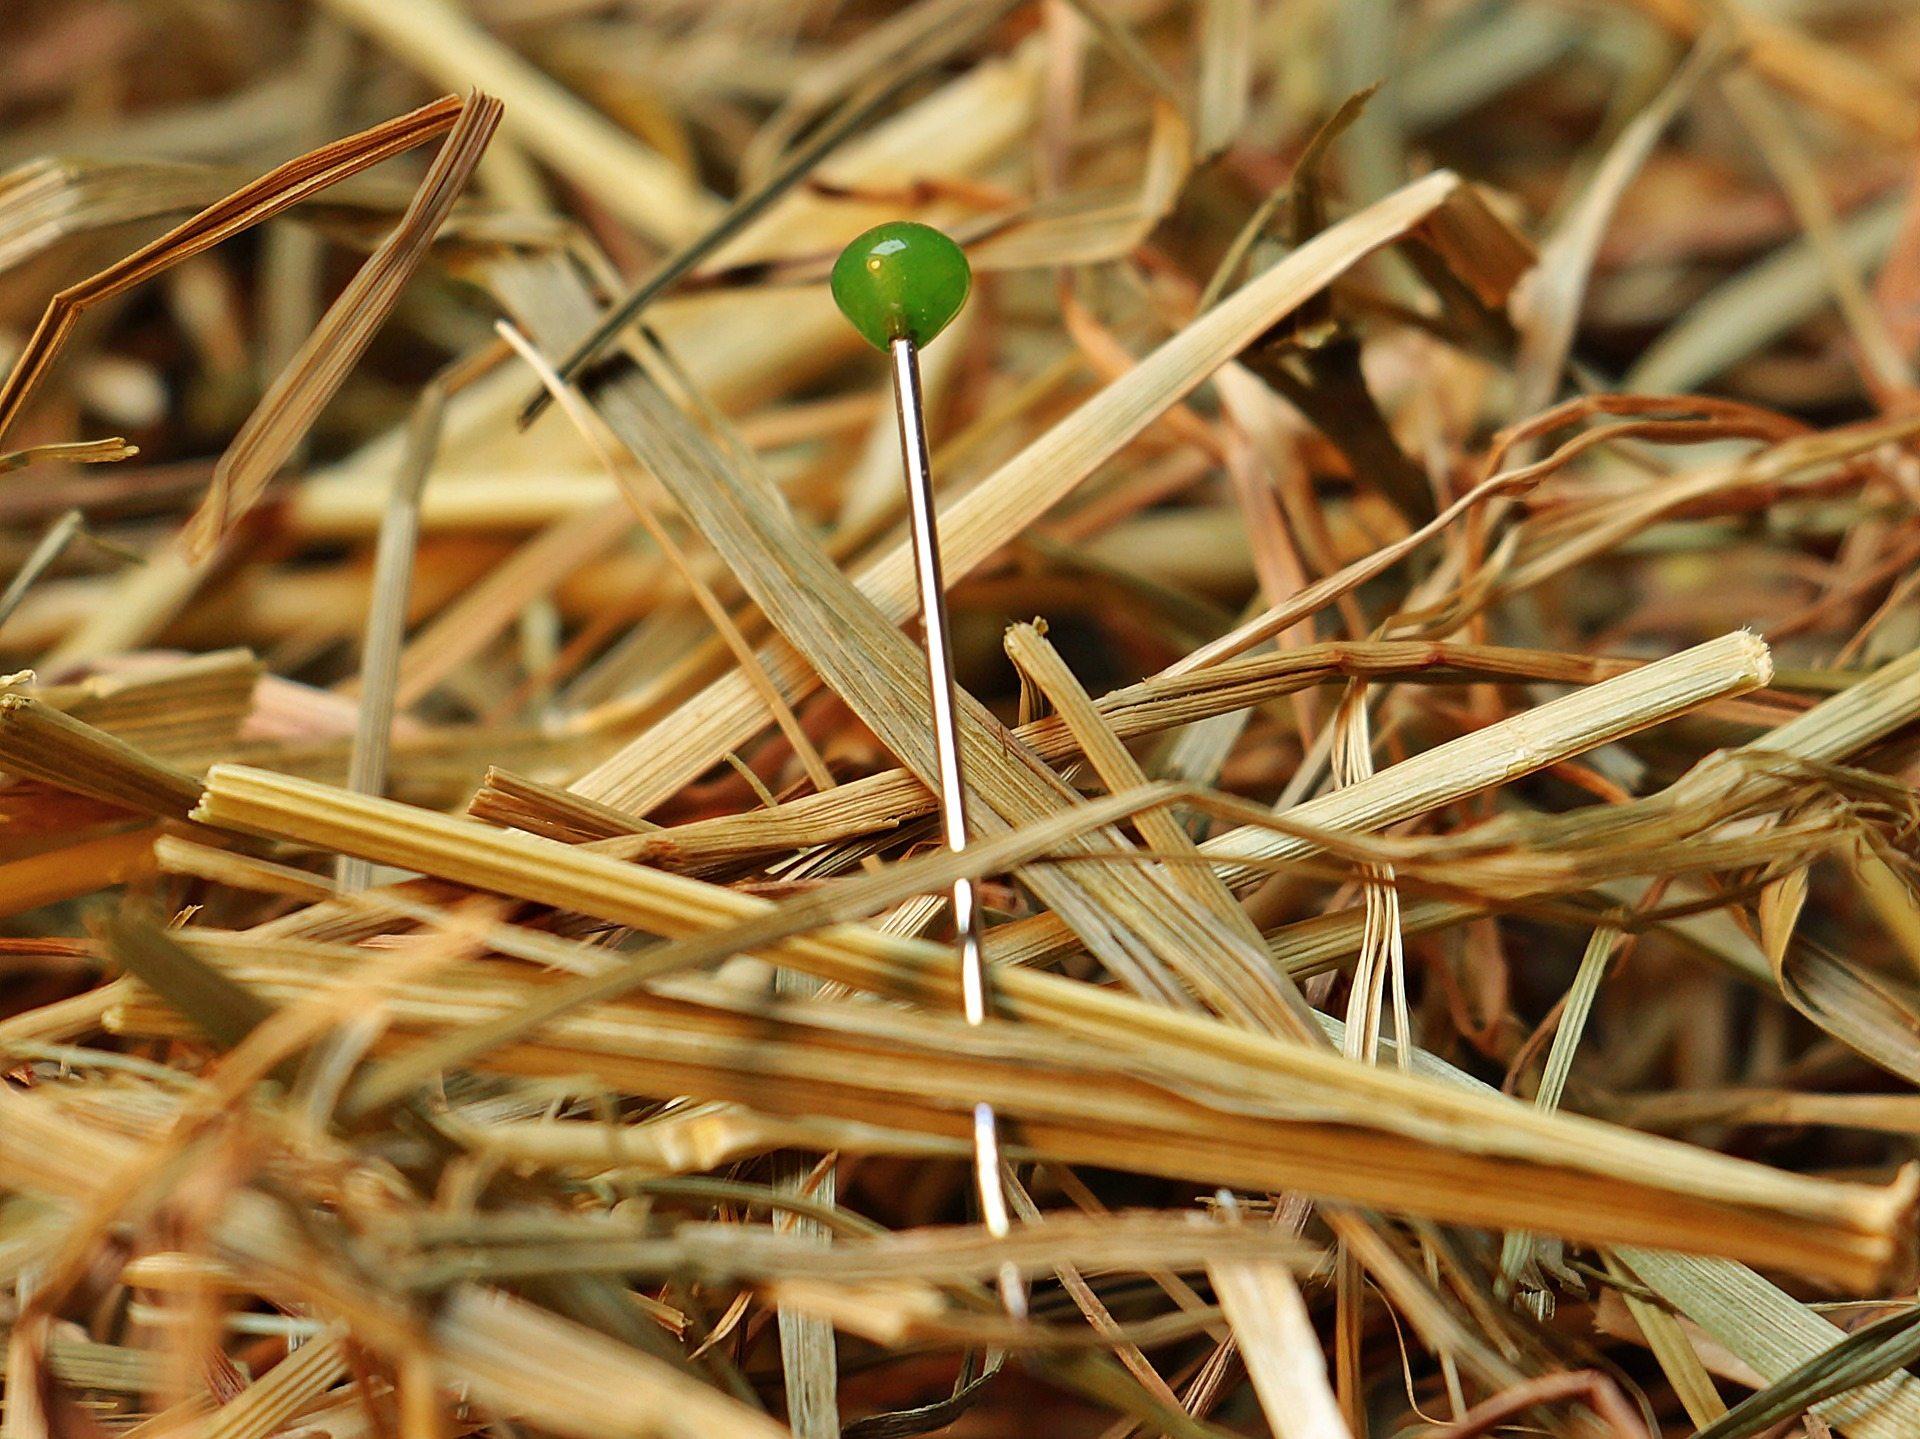 Women win - Pixabay needle-in-a-haystack-1752846_1920